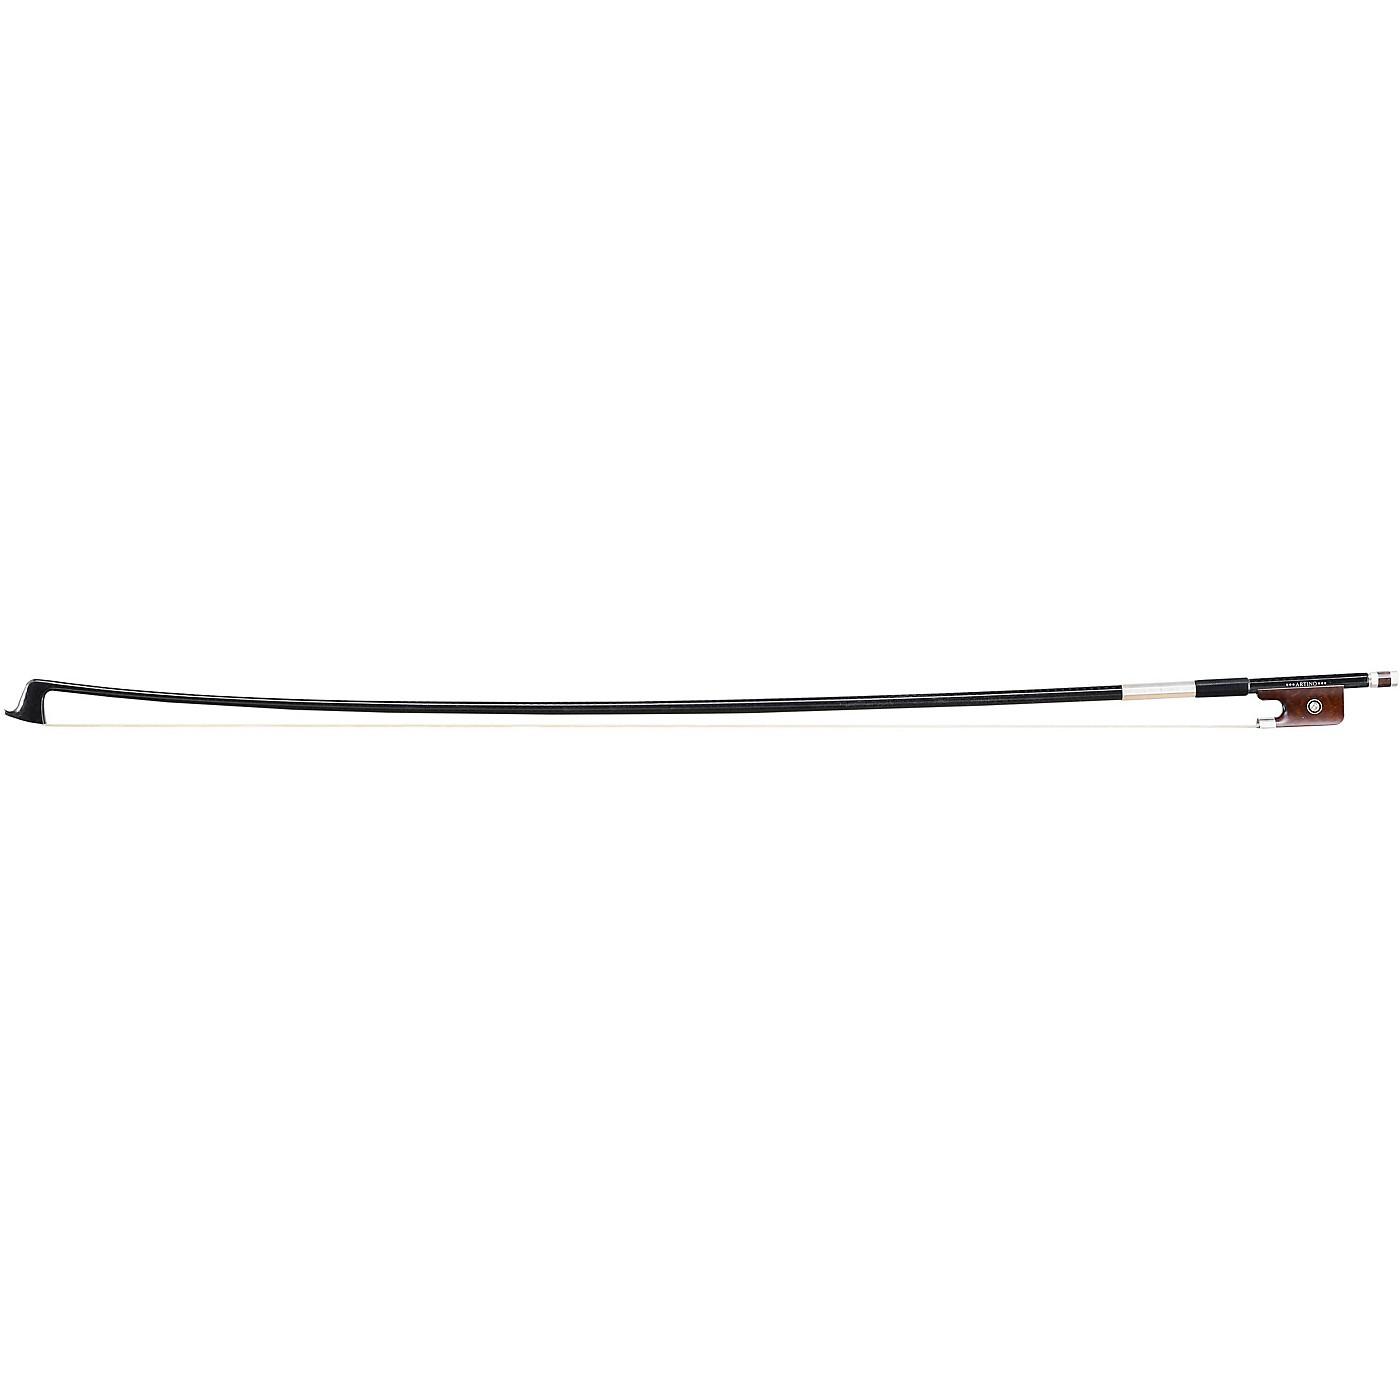 Artino Three Star Deluxe Carbon Fiber Viola Bow thumbnail